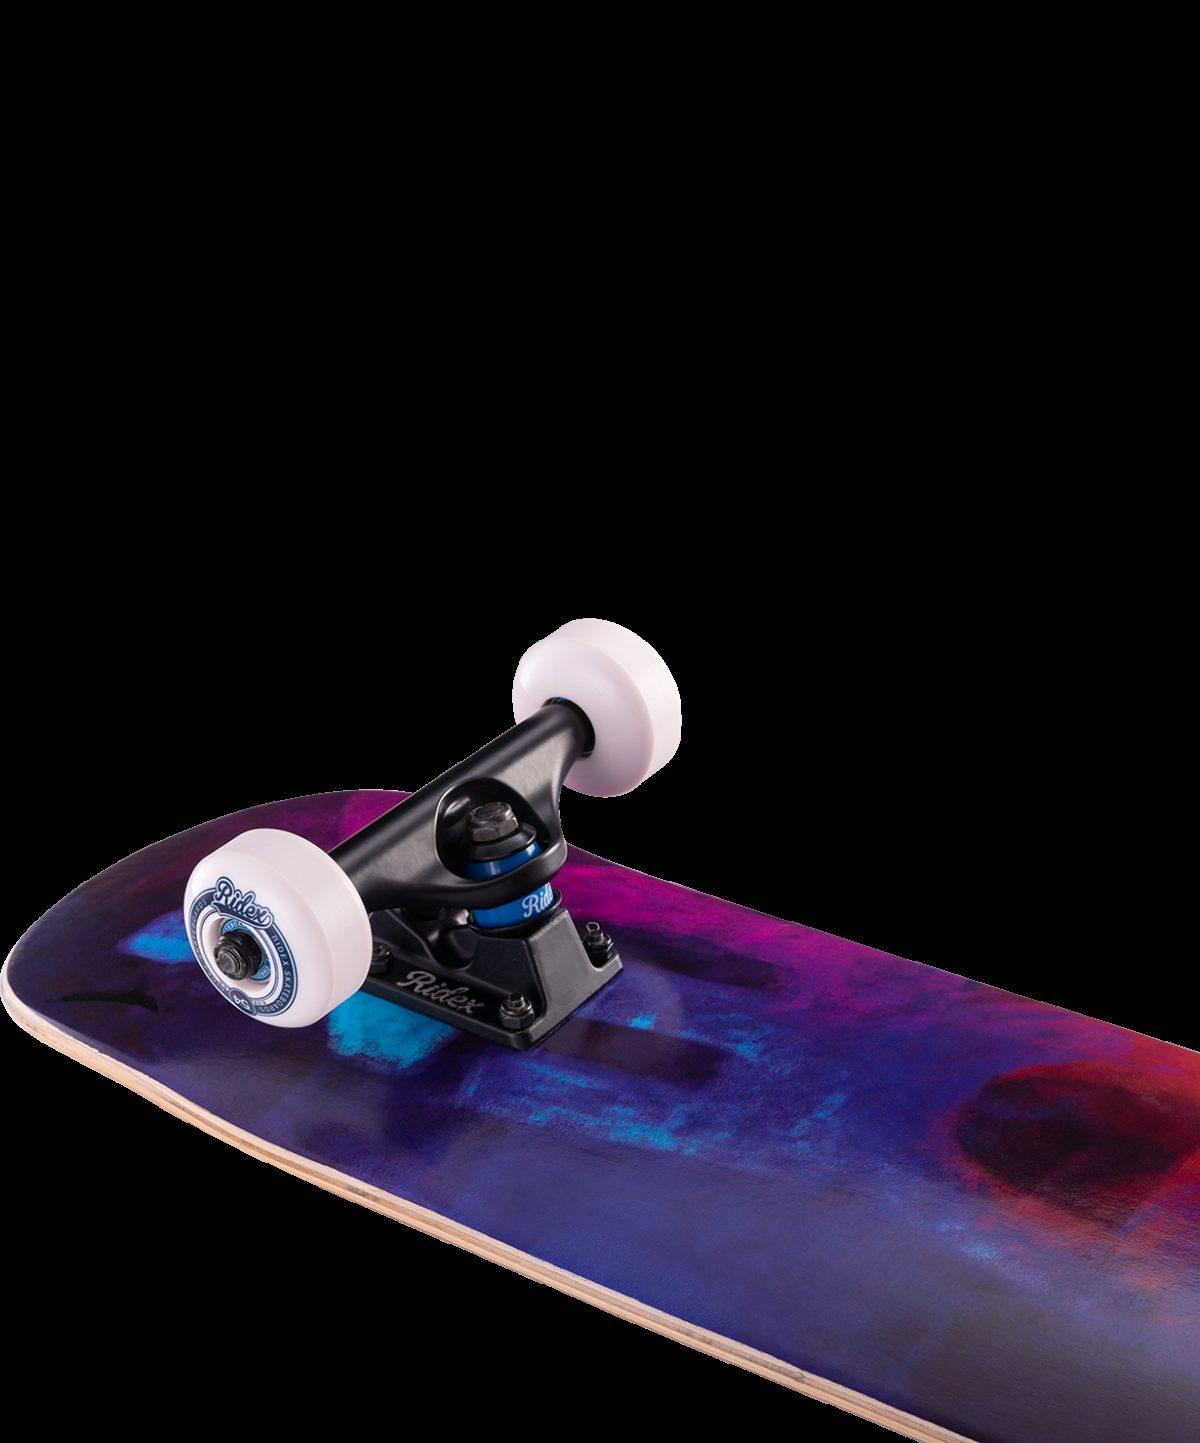 RIDEX скейтборд Inflame - 3